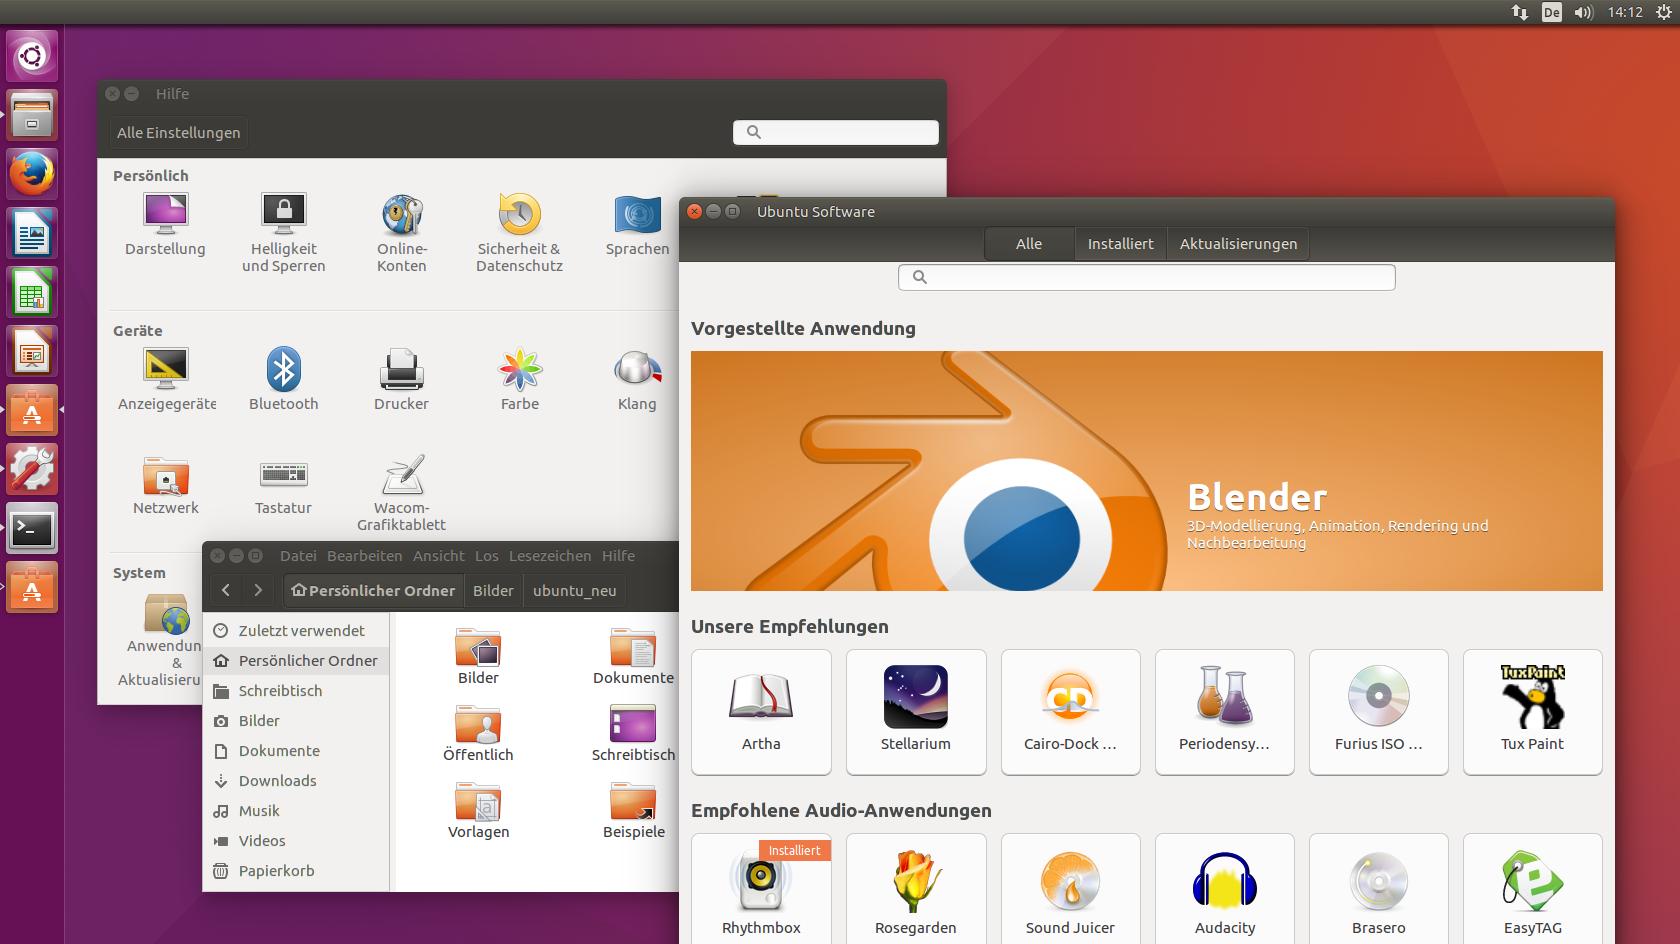 ubuntu 16.04 lts: linux mit langzeitunterstützung | c't magazin